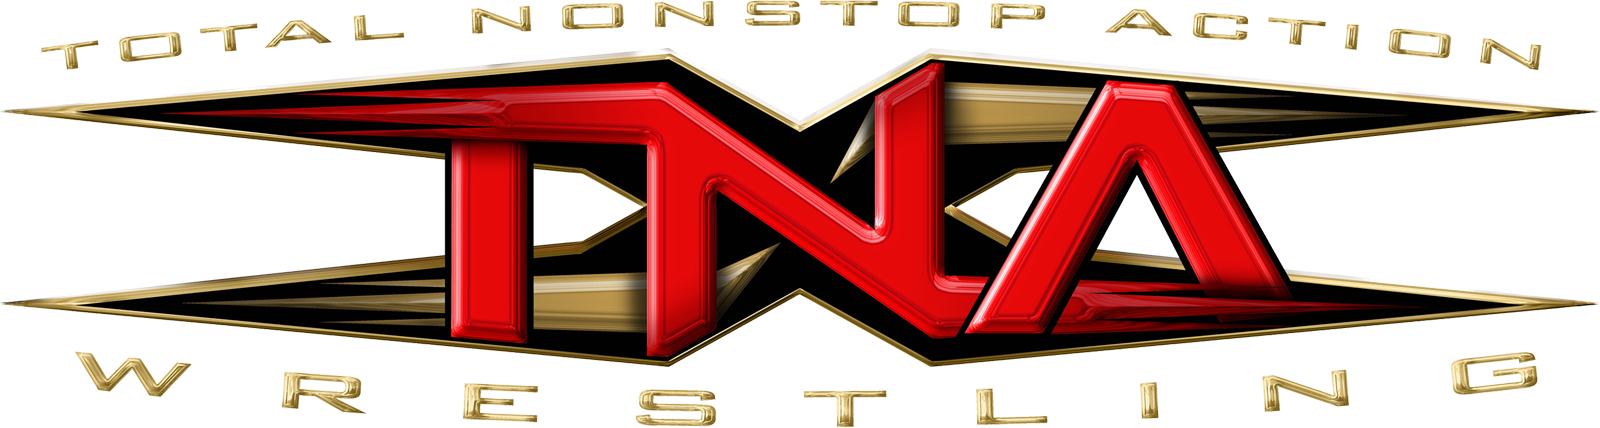 Impact Wrestling (company)   Logopedia   FANDOM powered by Wikia